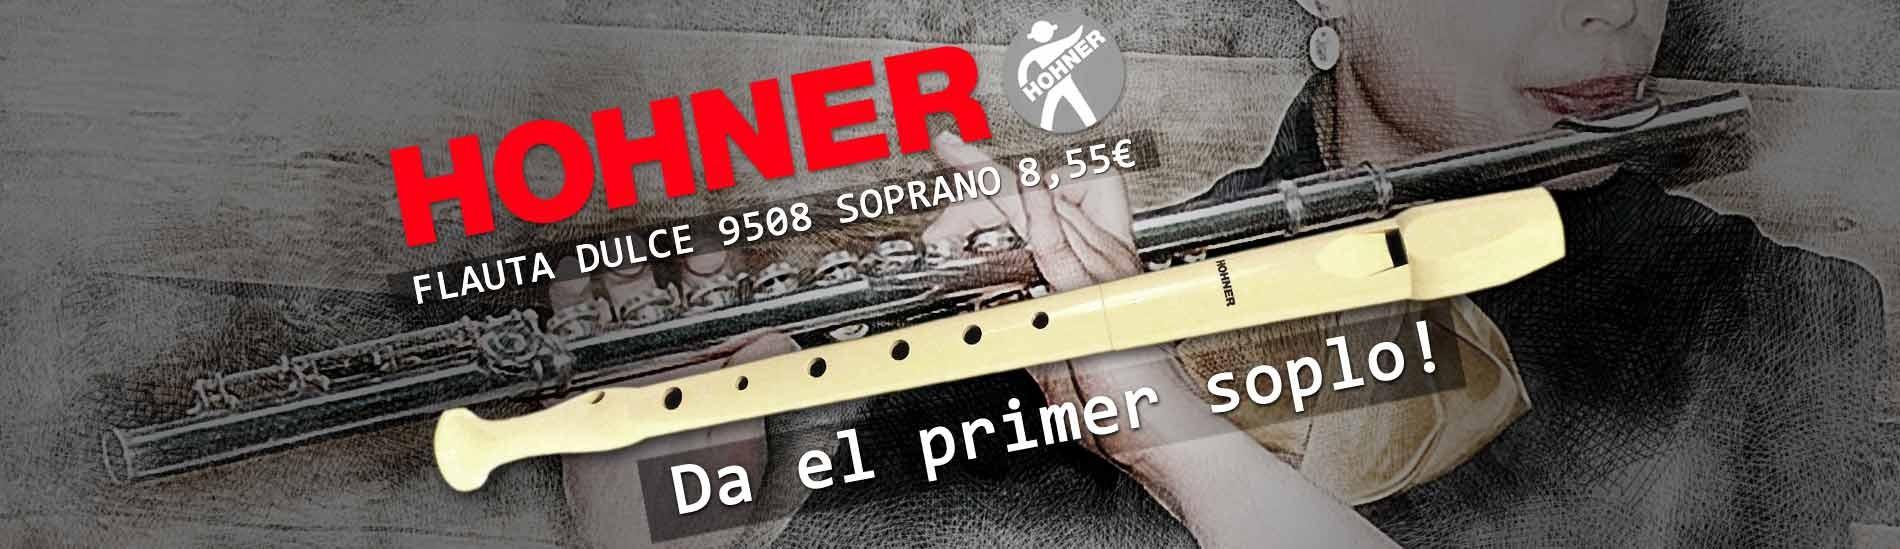 Flauta Dulce Hohner 9508 Soprano